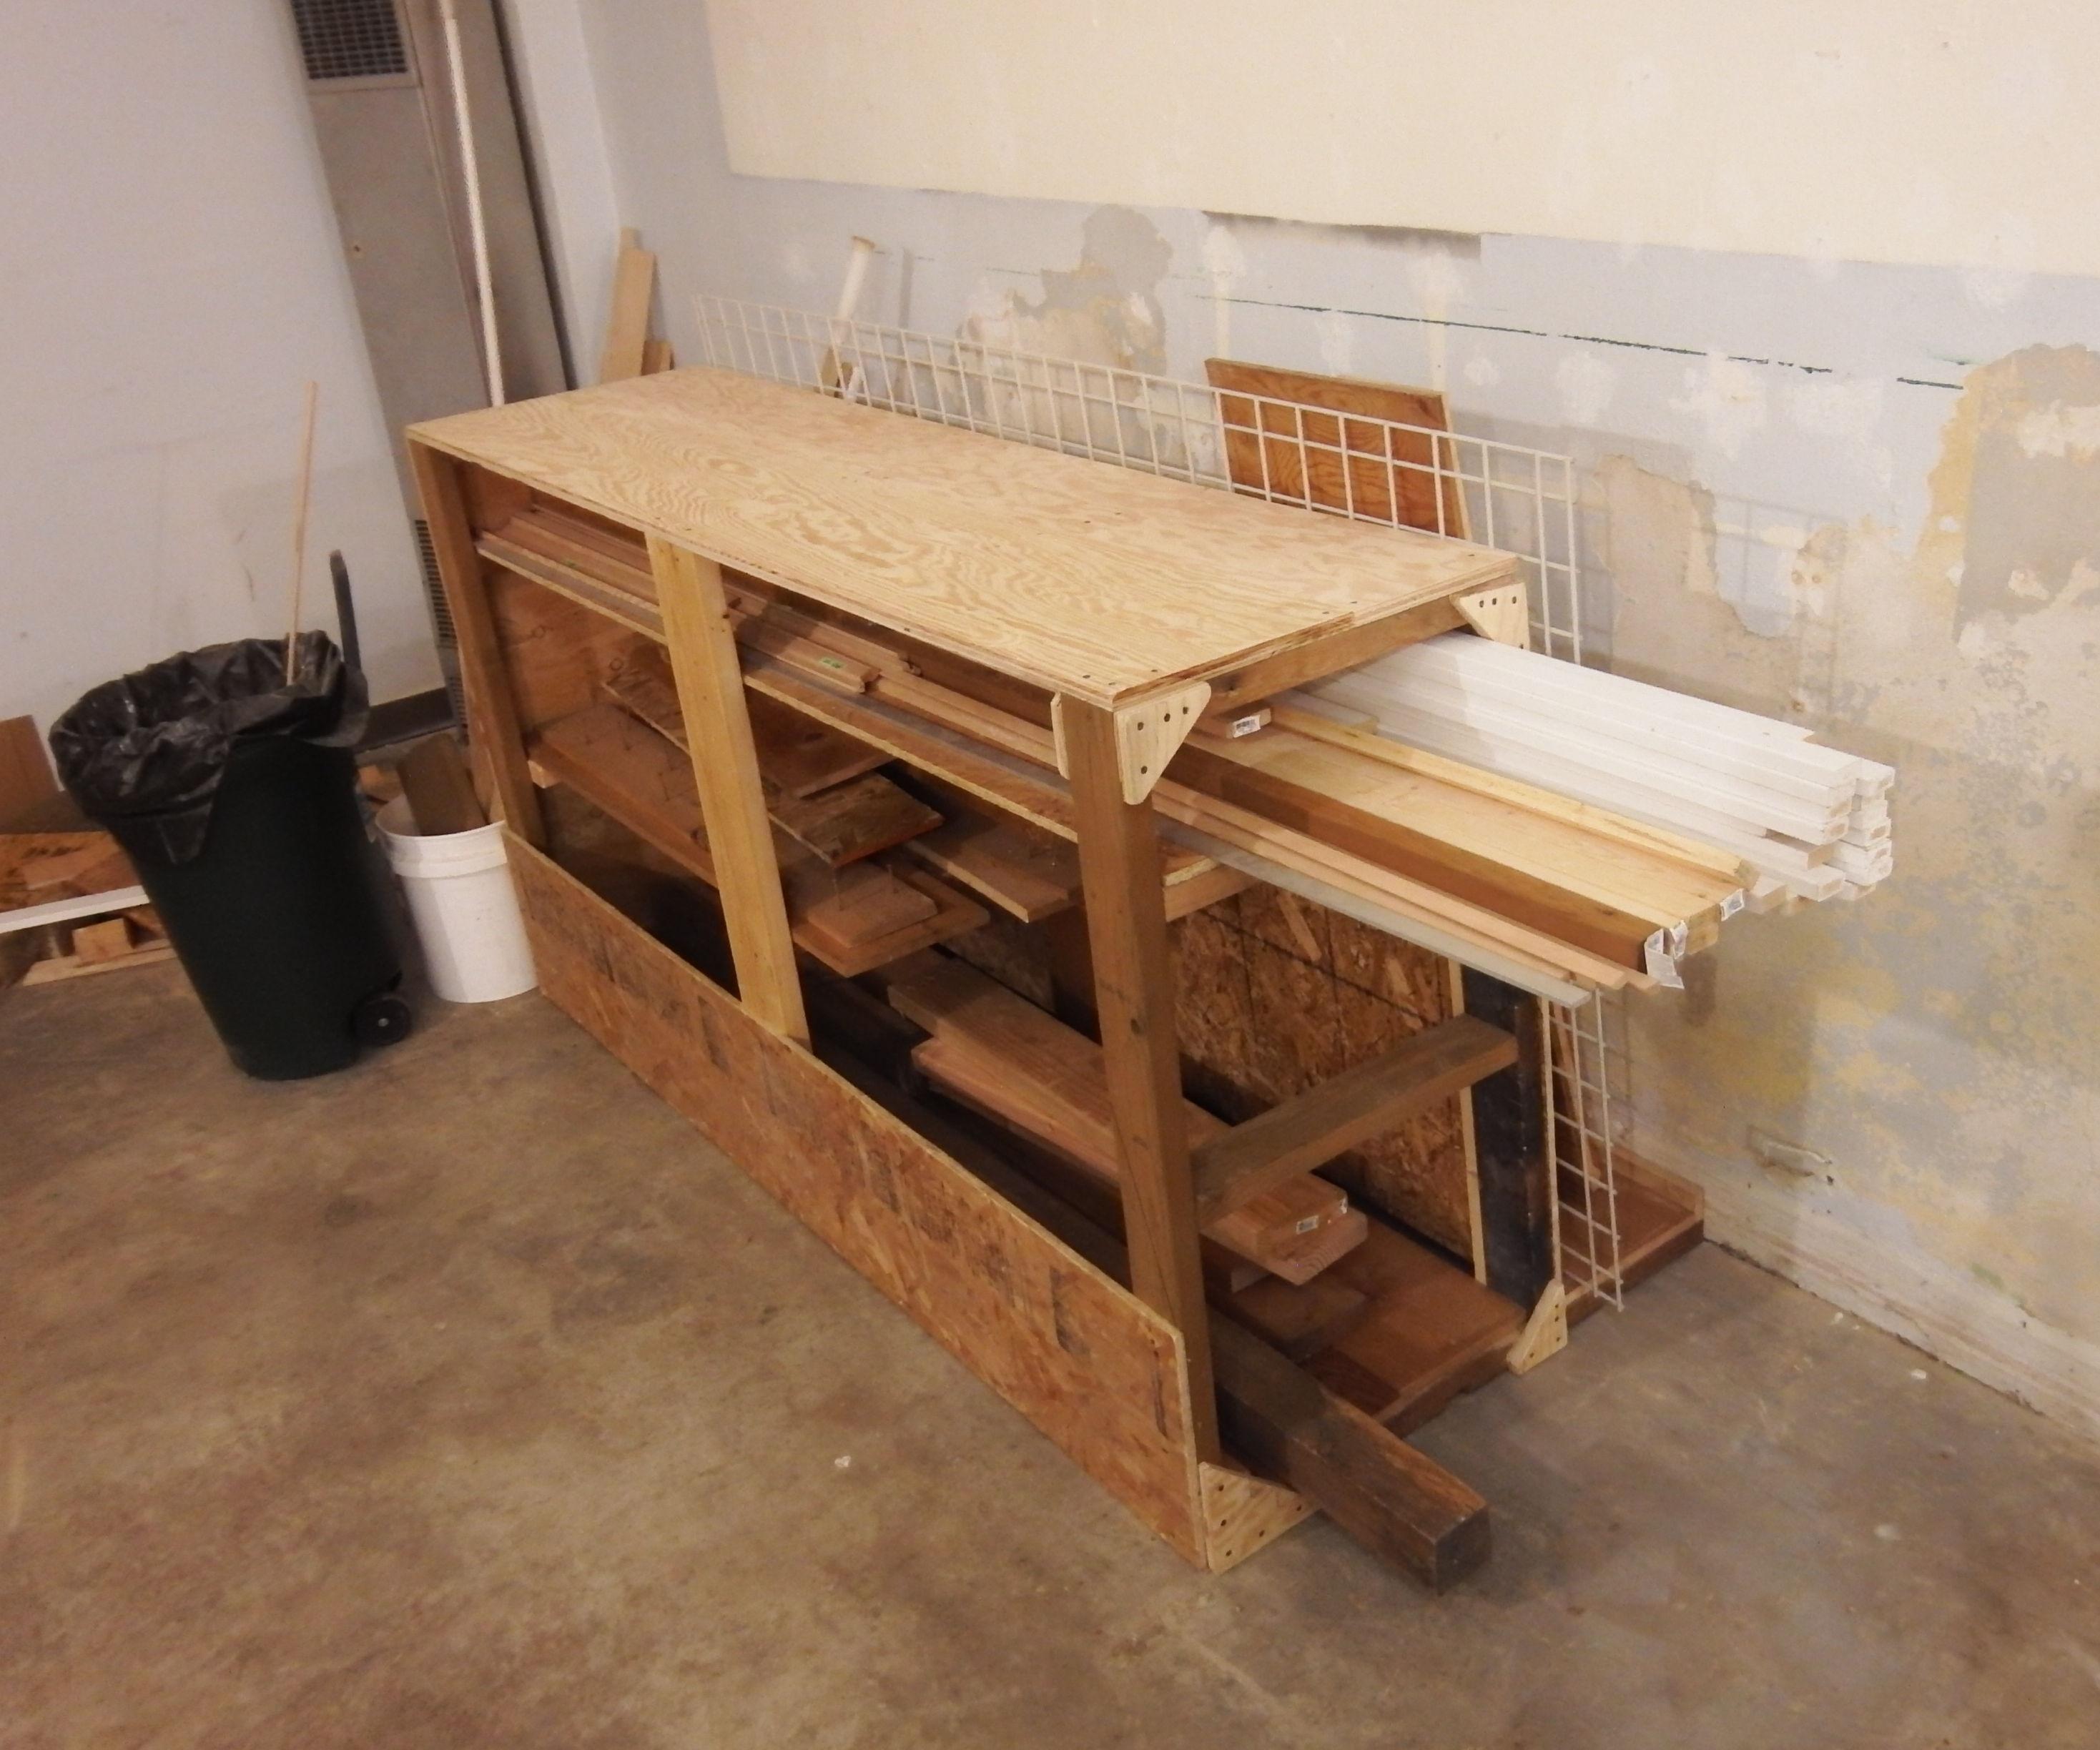 Lumber Storage Rack Made from Scrap